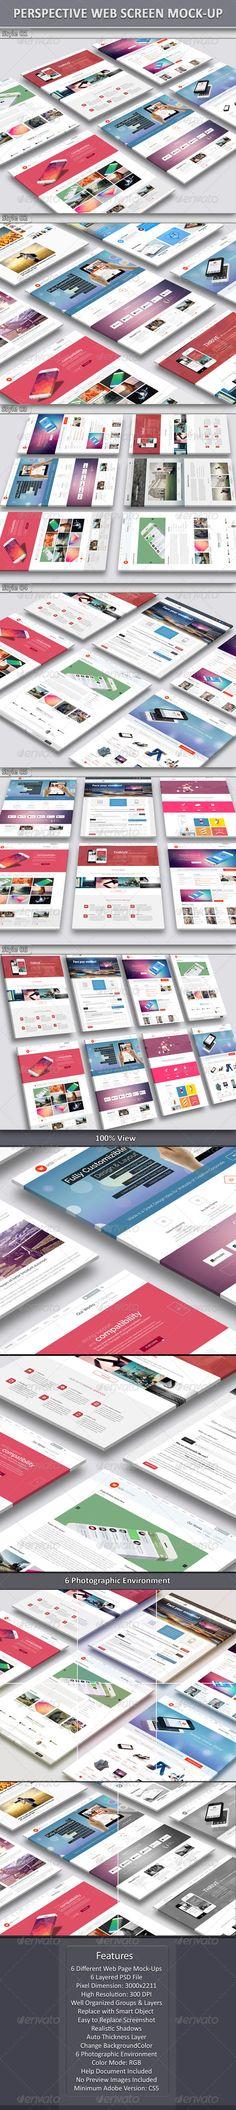 Perspective Web Screen Mock-Up - Website Displays Mockup - Website Mockup Design - Download Here : http://graphicriver.net/item/perspective-web-screen-mockup/6993268?s_rank=1&ref=yinkira